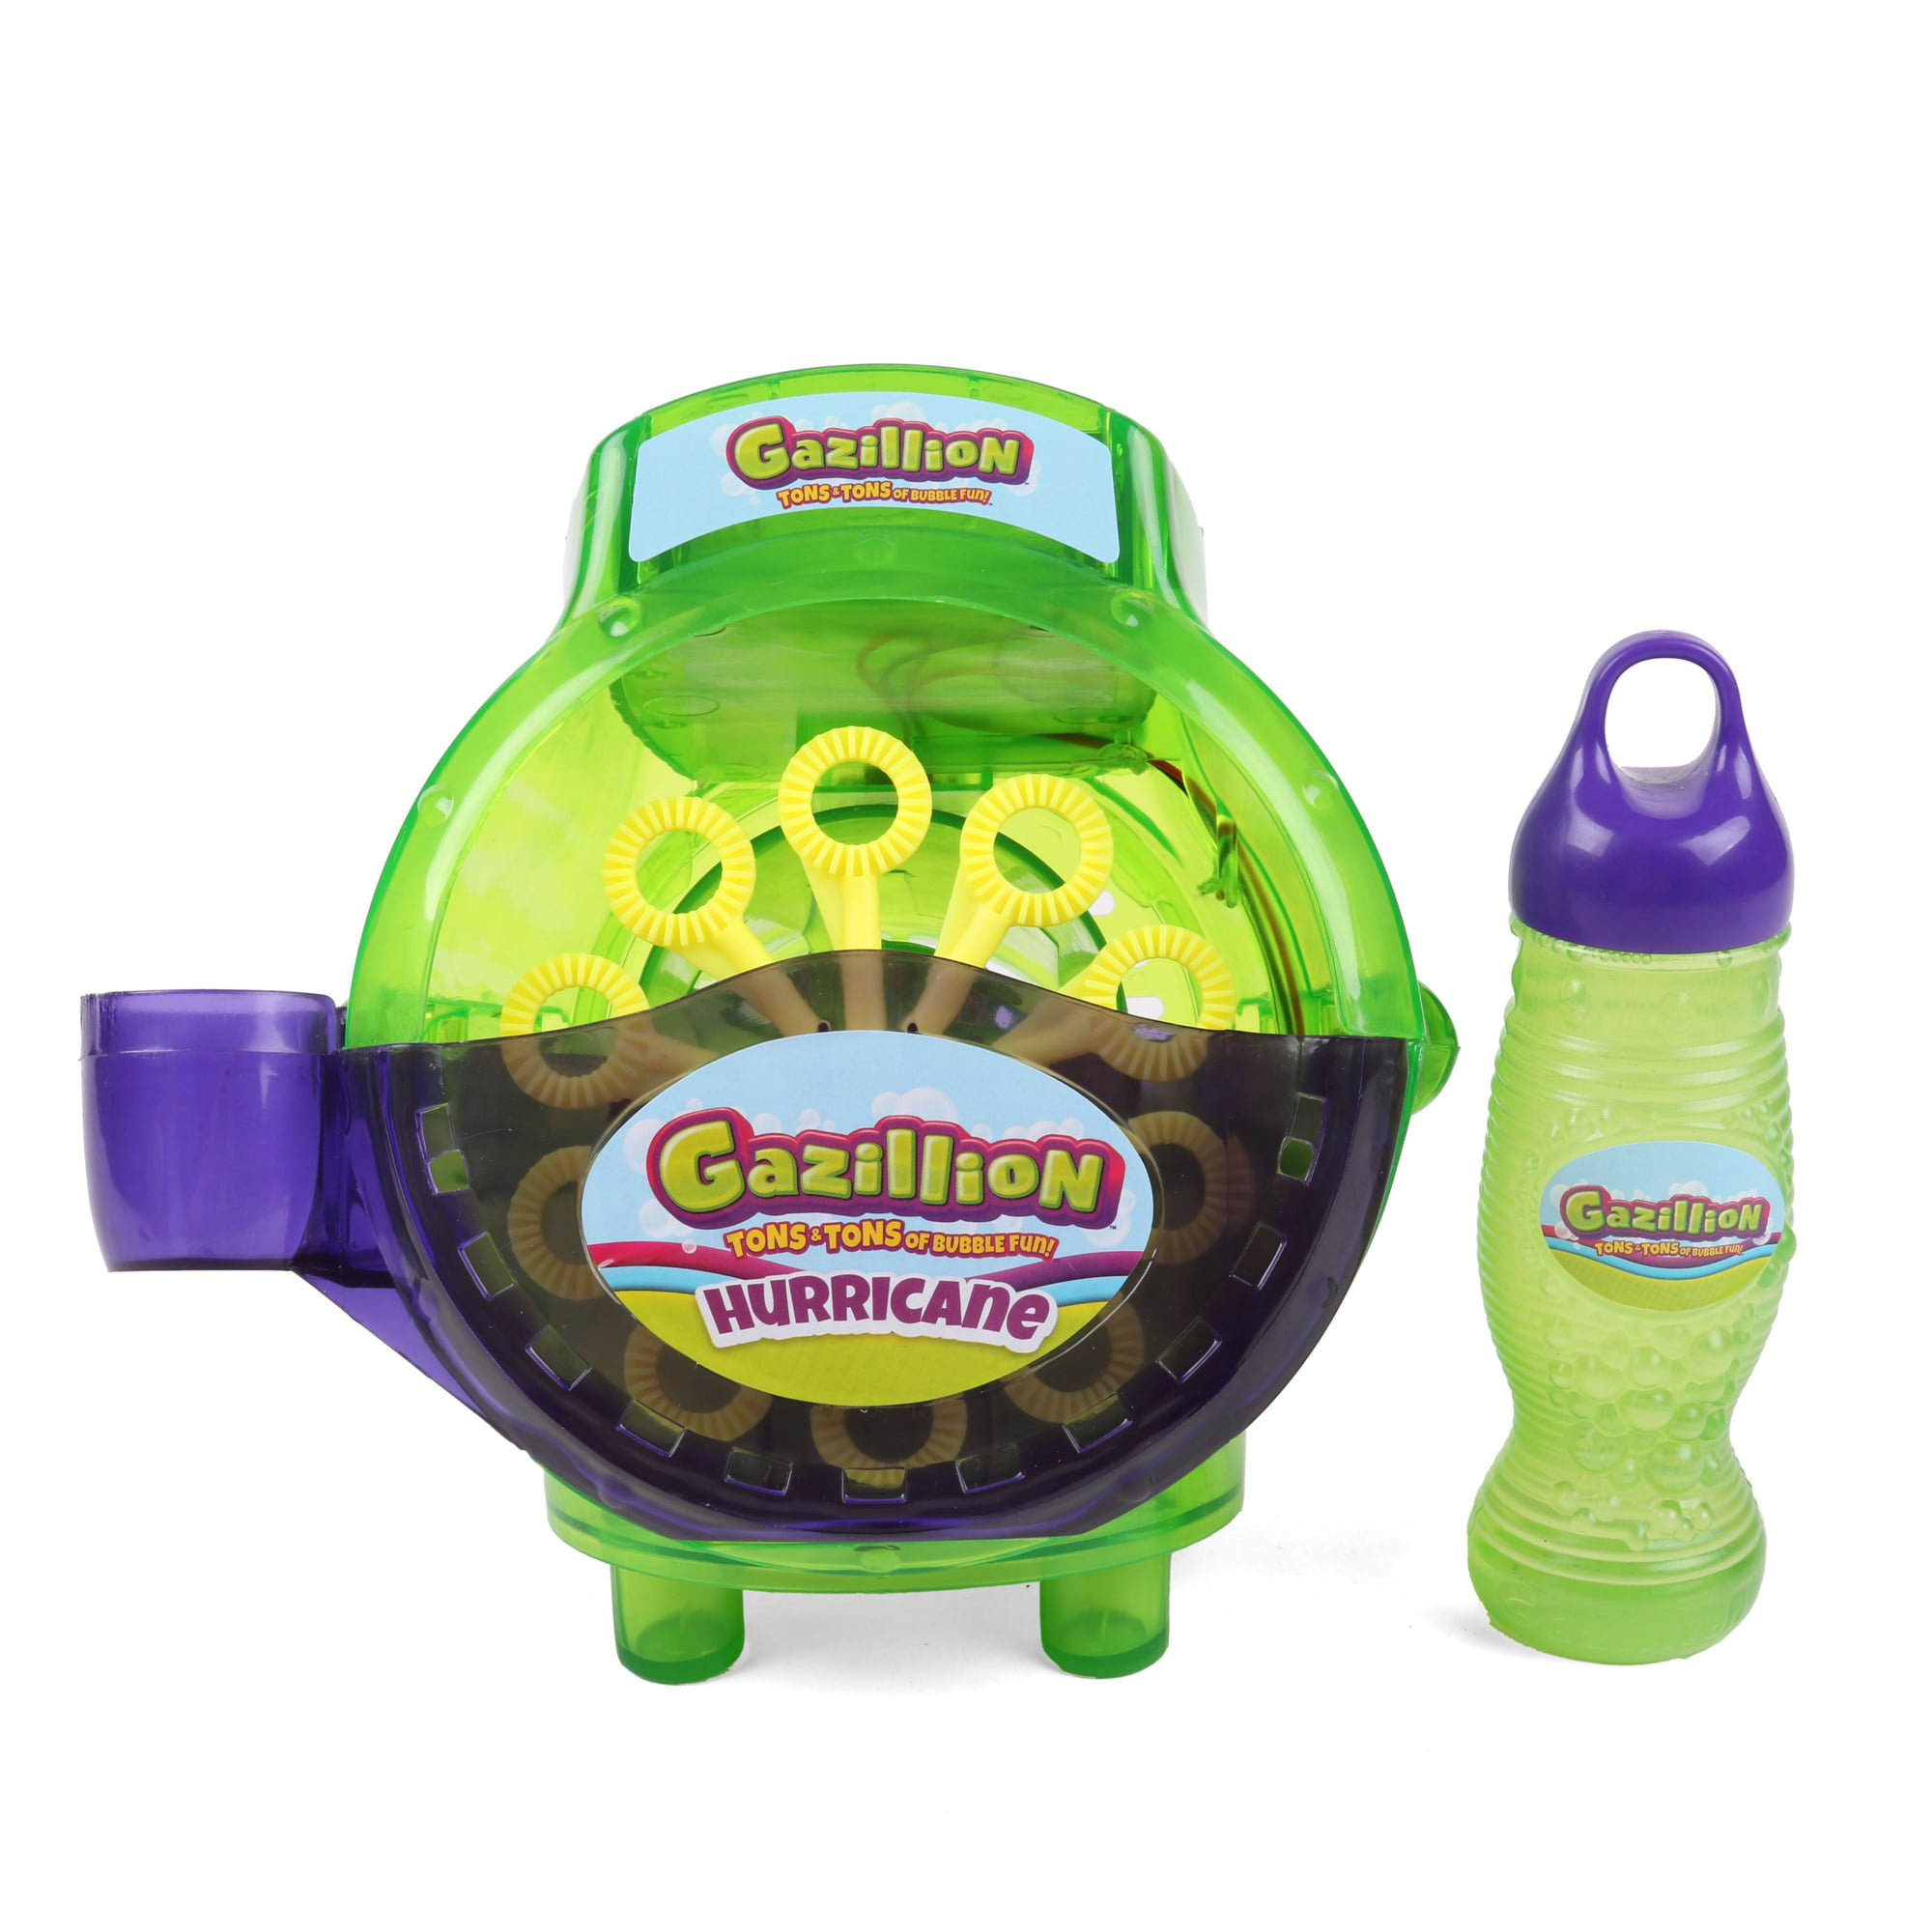 Funrise Toys - Gazillion Hurricane Bubble Machine - Walmart.com